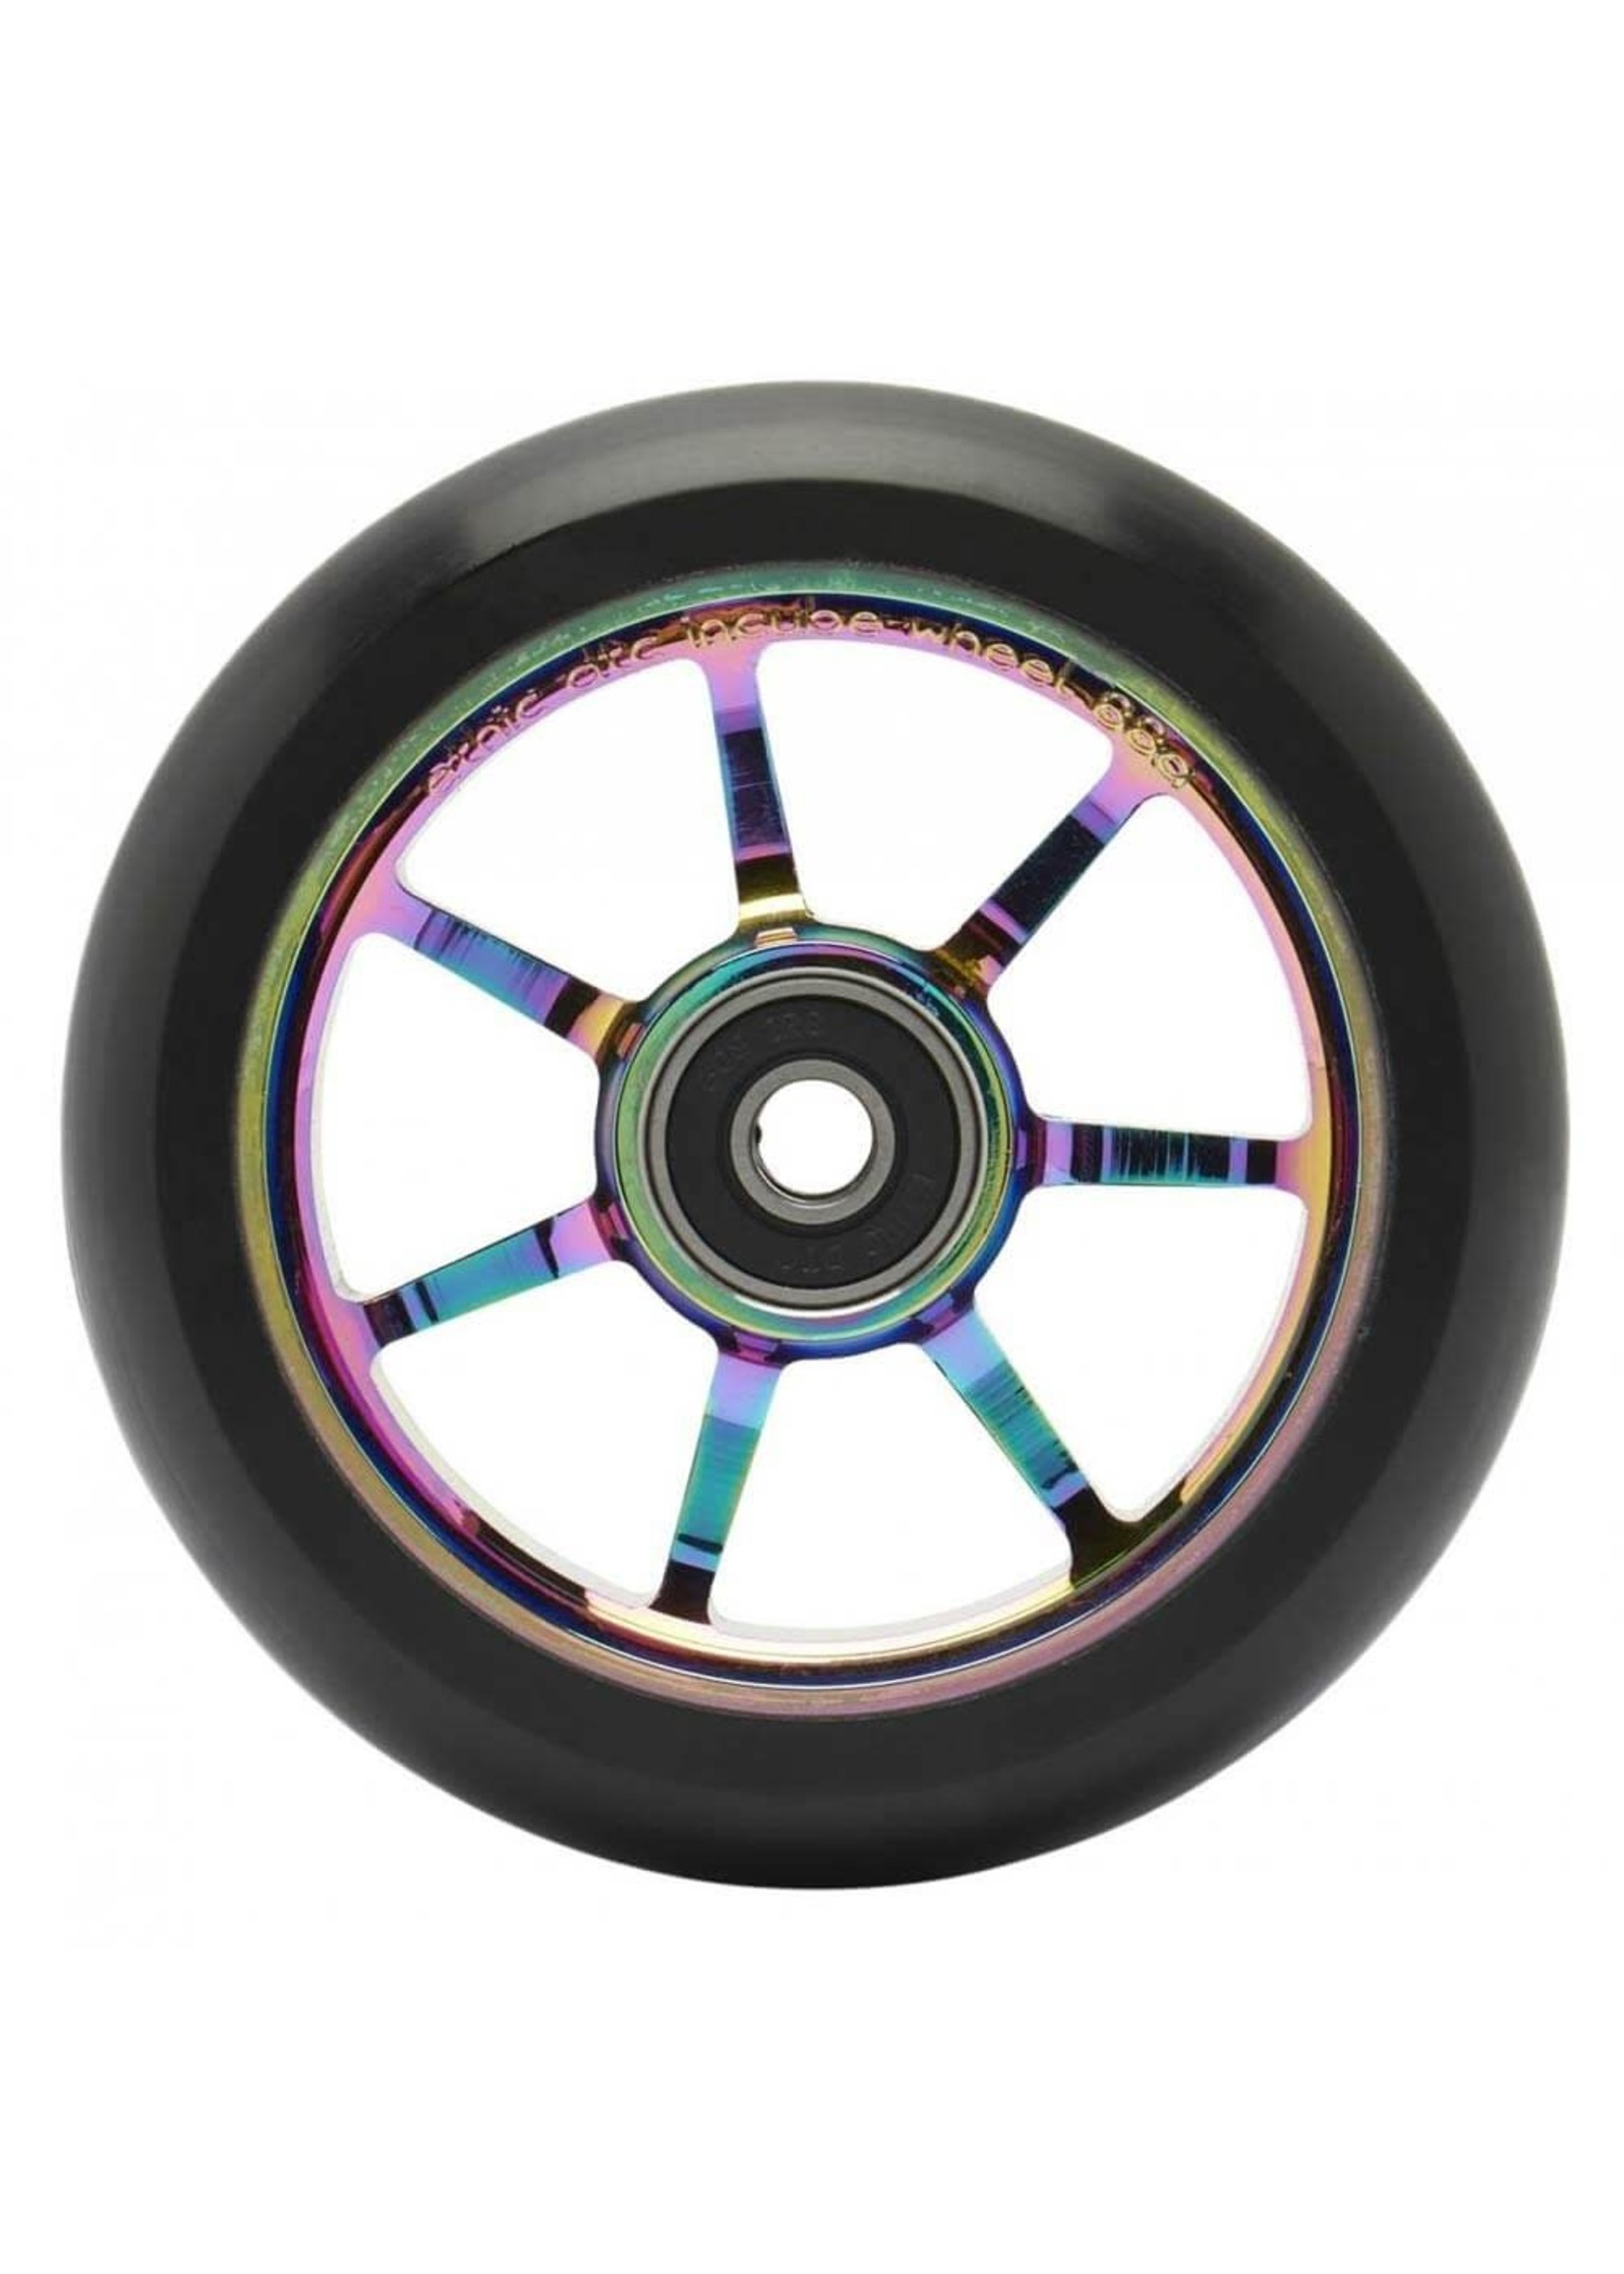 Ethic Ethic - Incube Wheel - 110mm